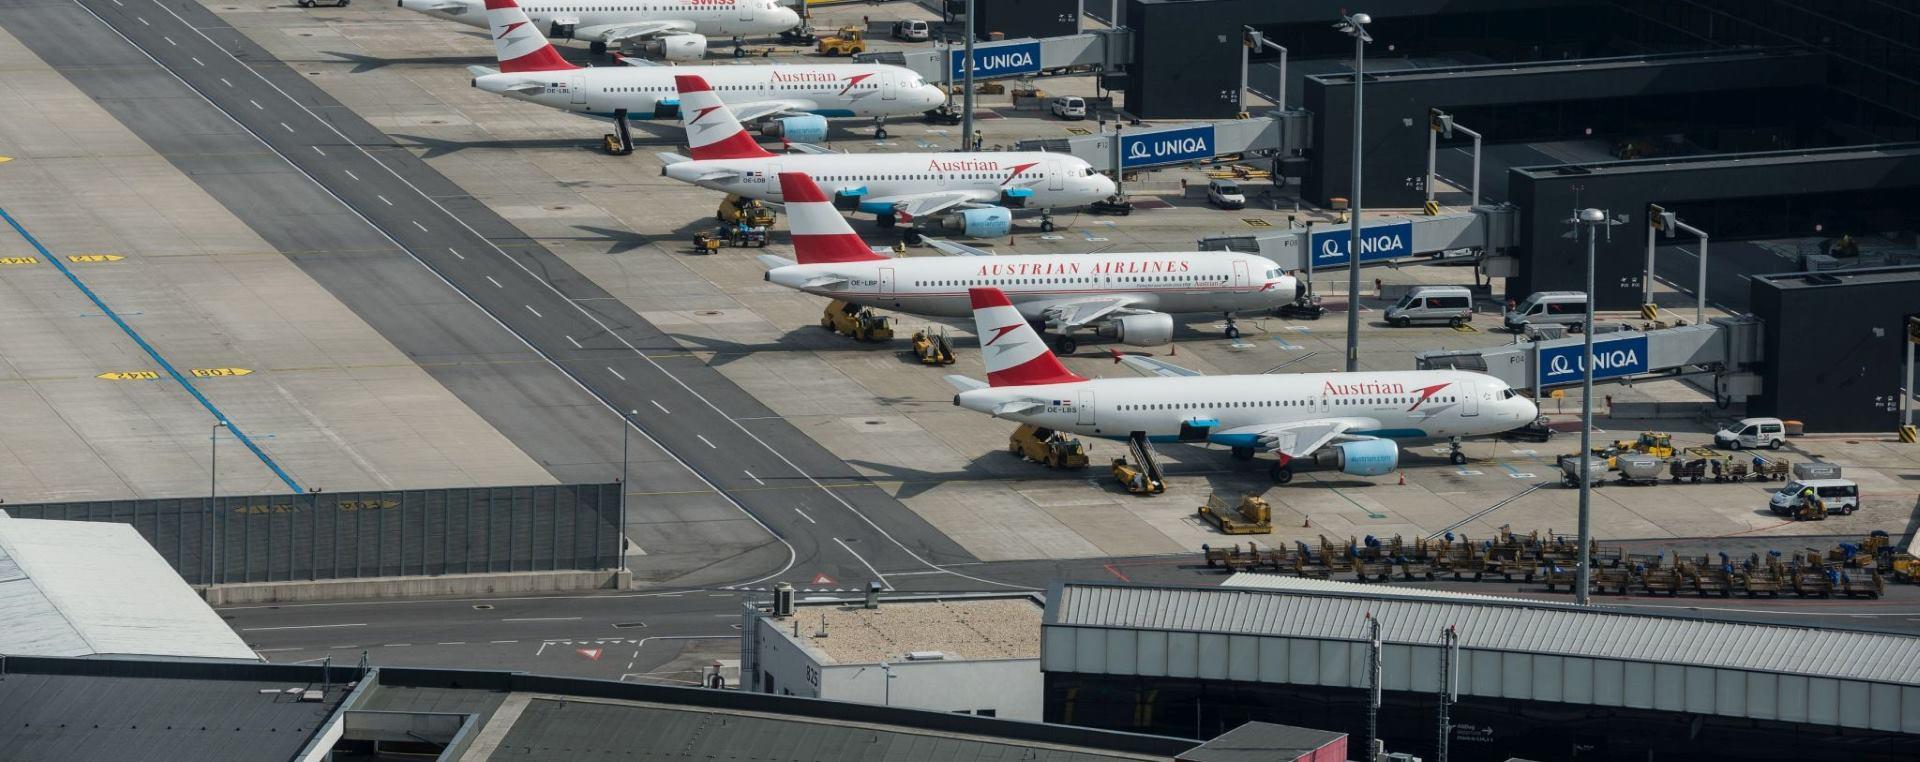 Bečka zračna luka nagarađena prestižnom nagradom